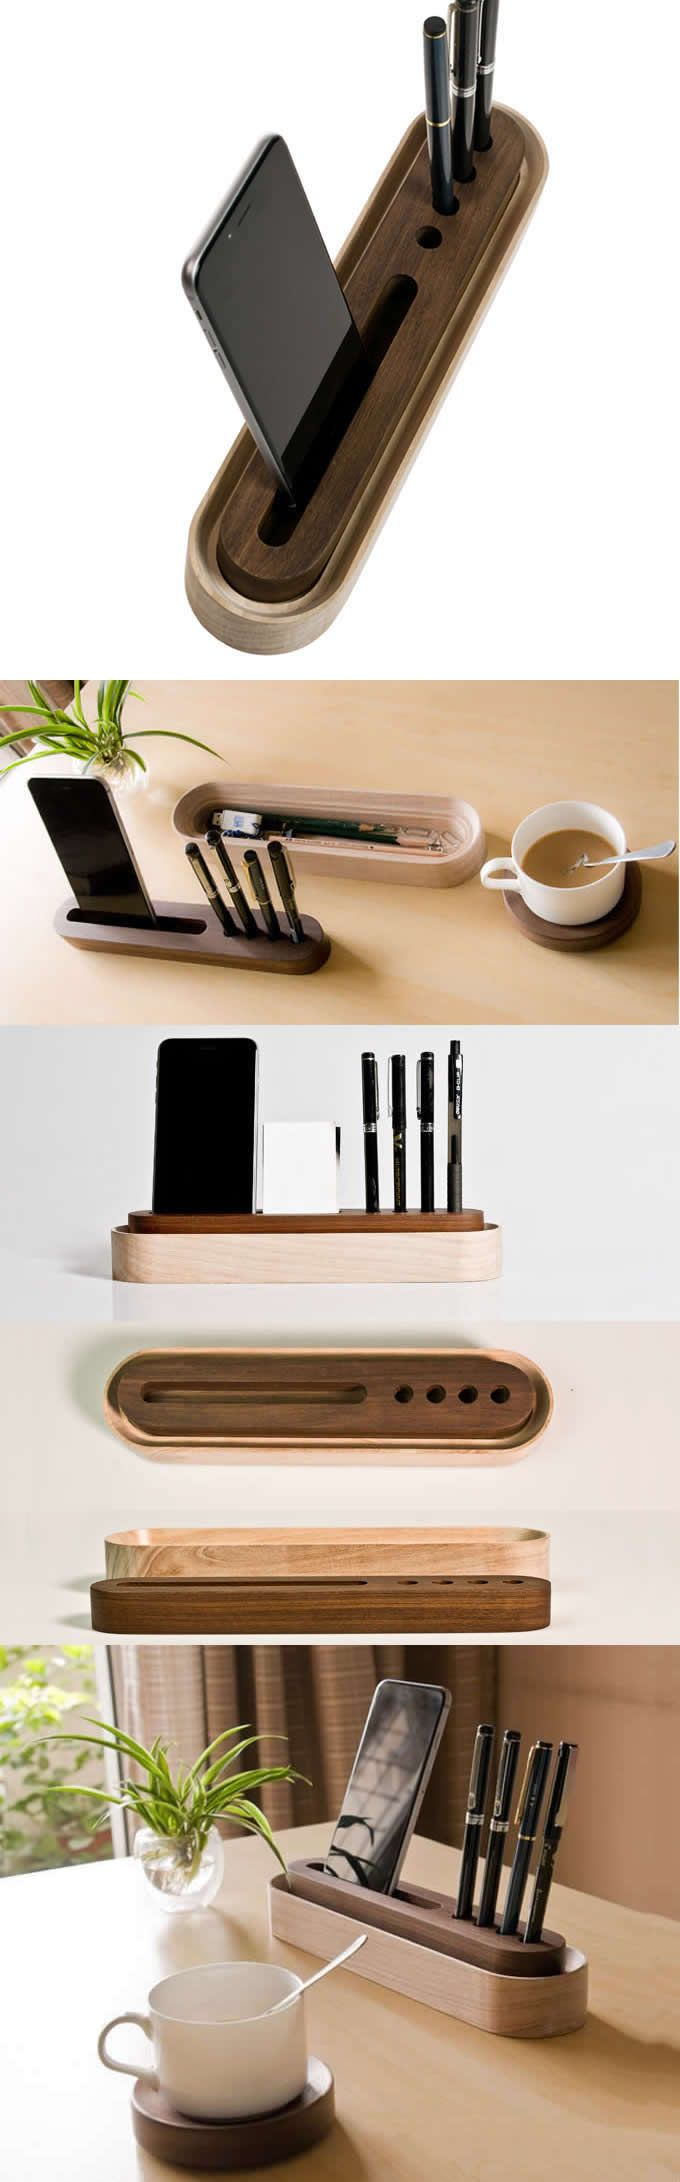 Wooden Office Supplies Desk Organizer Storage Container Phone Stand Holder Pen Pencil Busin In 2020 Desk Accessories Office Desk Organization Office Decor Organization